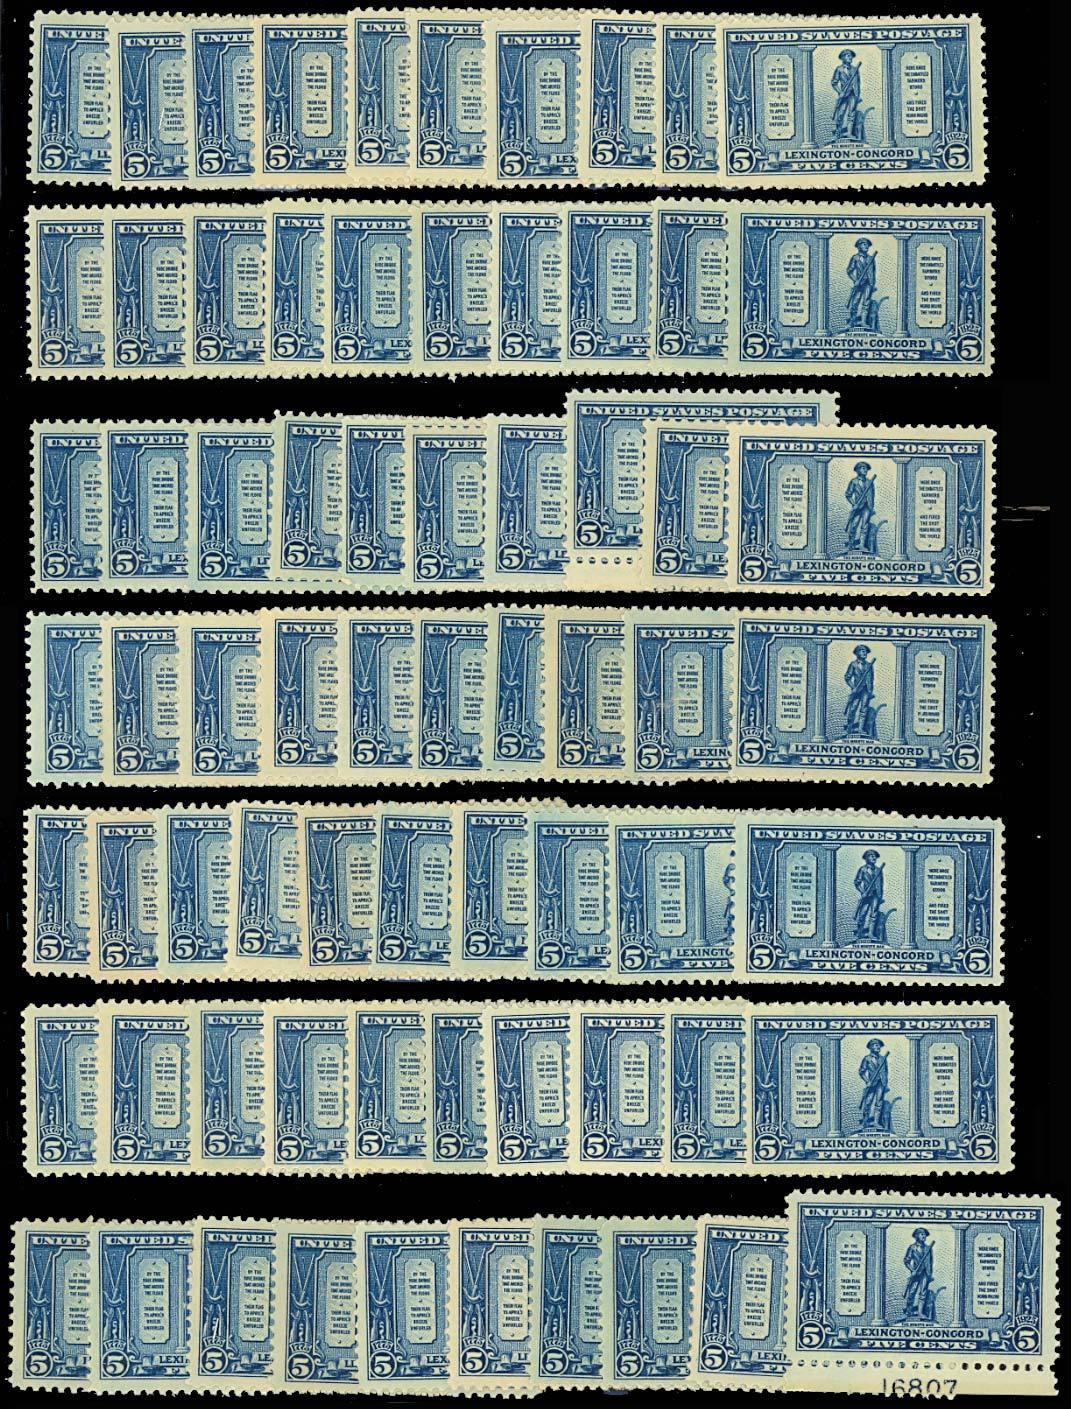 619, Mint LH 5c Minute Man - 70 COPIES! - Generally VF & Fresh! Cat $1,050.00 image 2